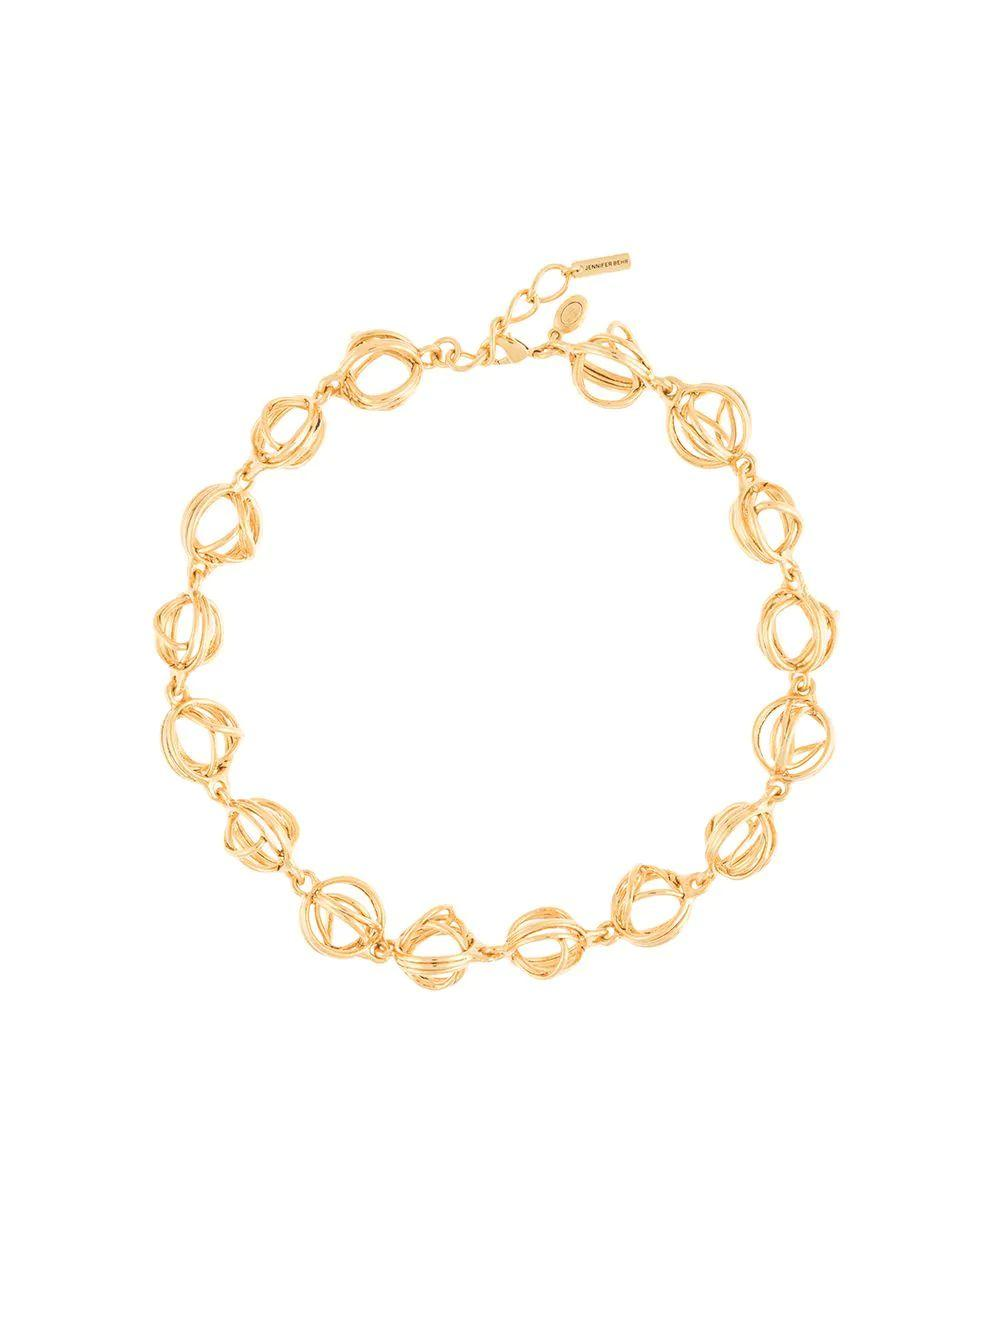 Kellis Chunky Chain Necklace Item # 111PA4